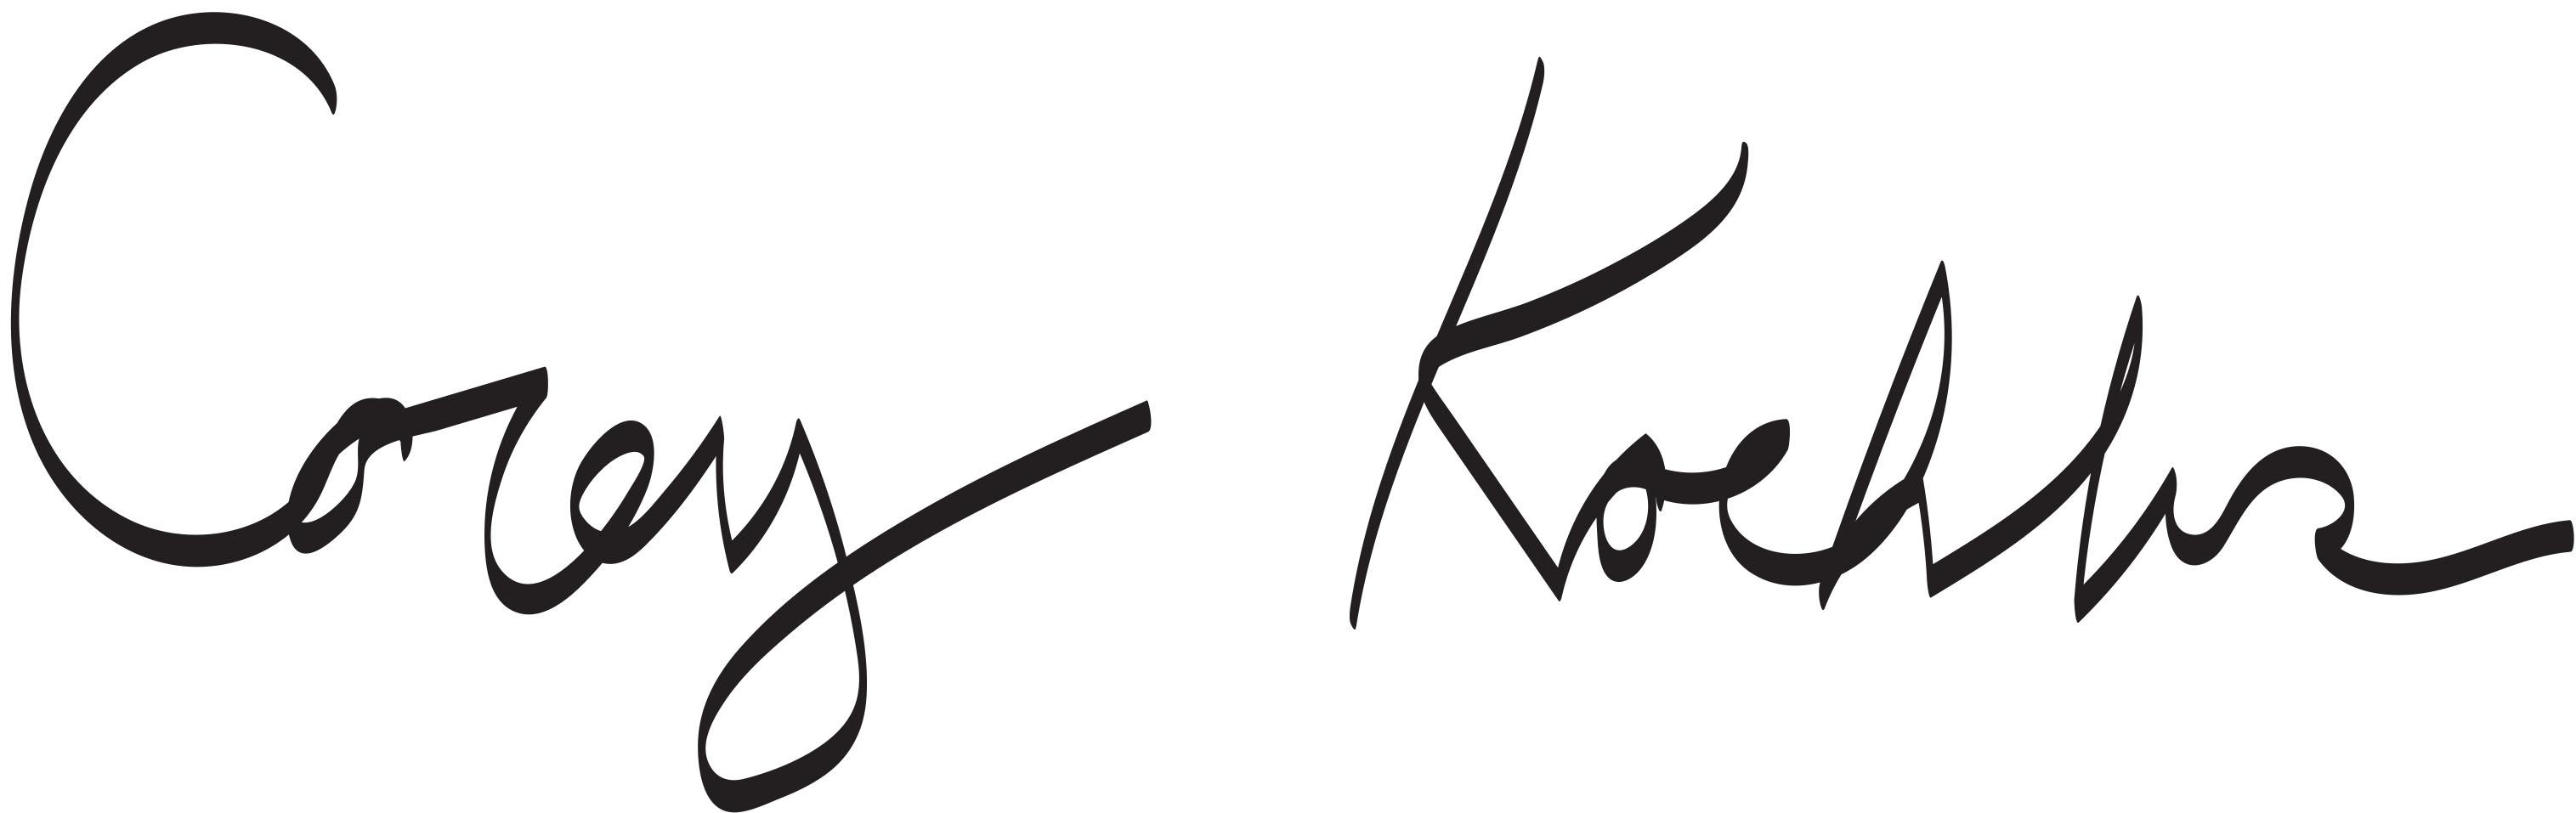 Corey koehler's Signature